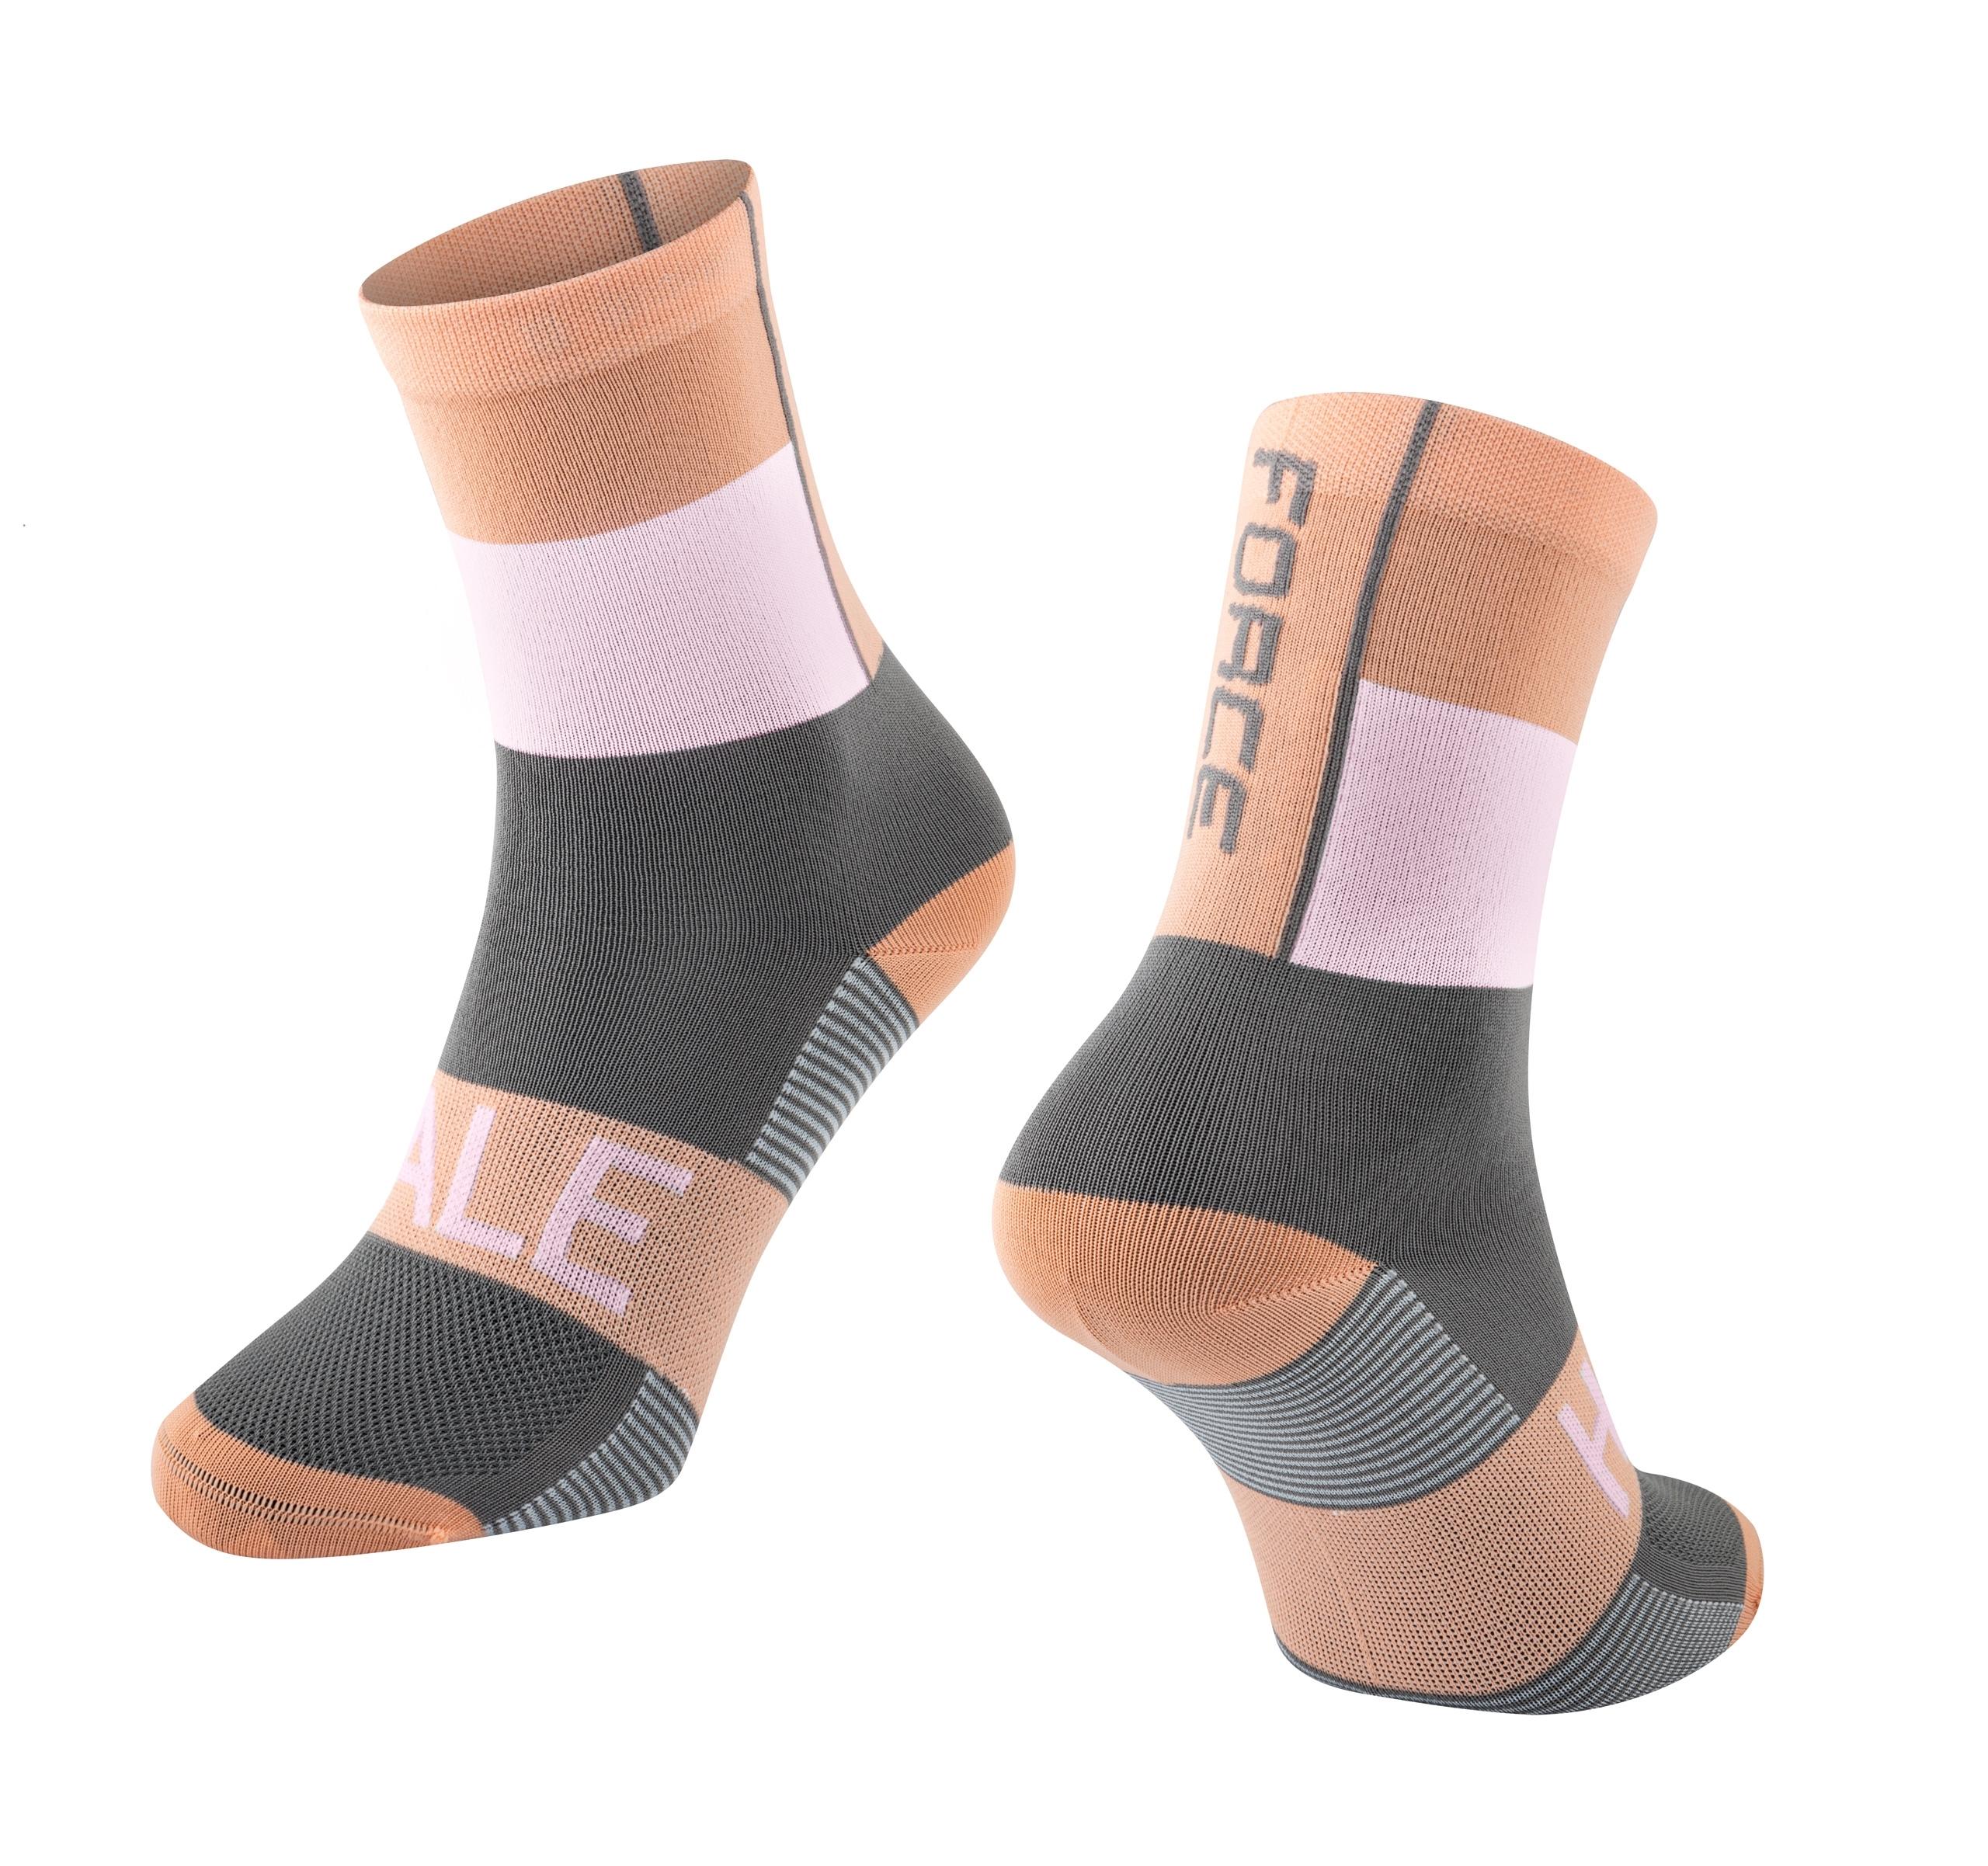 ponožky FORCE HALE, oranžovo-bílo-šedé L-XL/42-47